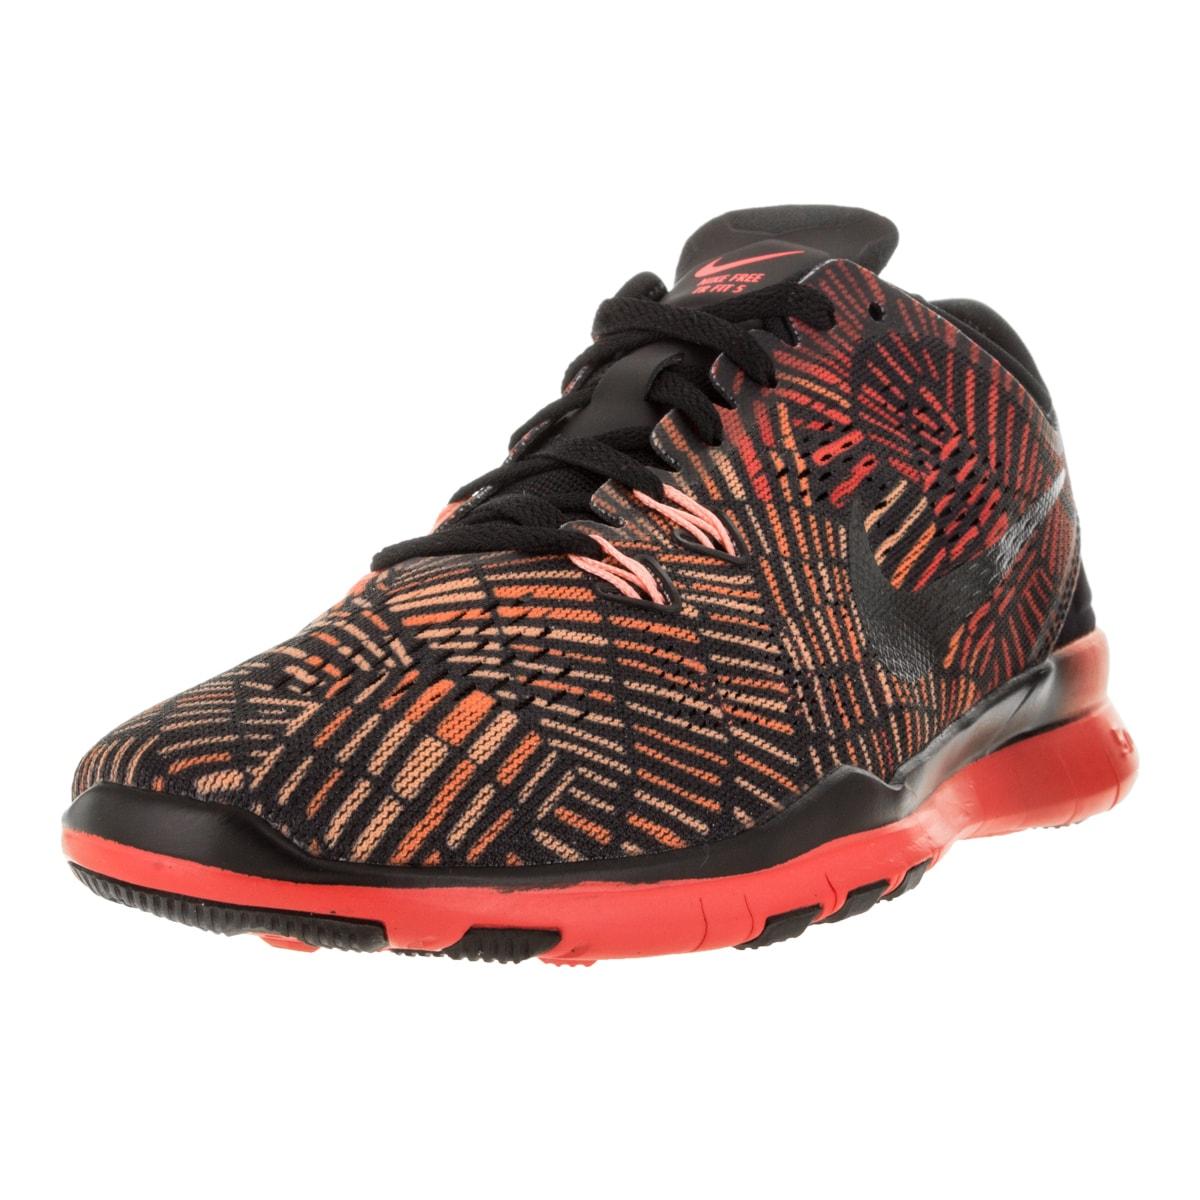 Nike Women's Free 5.0 Tr Fit 5 Prt Black/Black/Brgh/Atmc ...